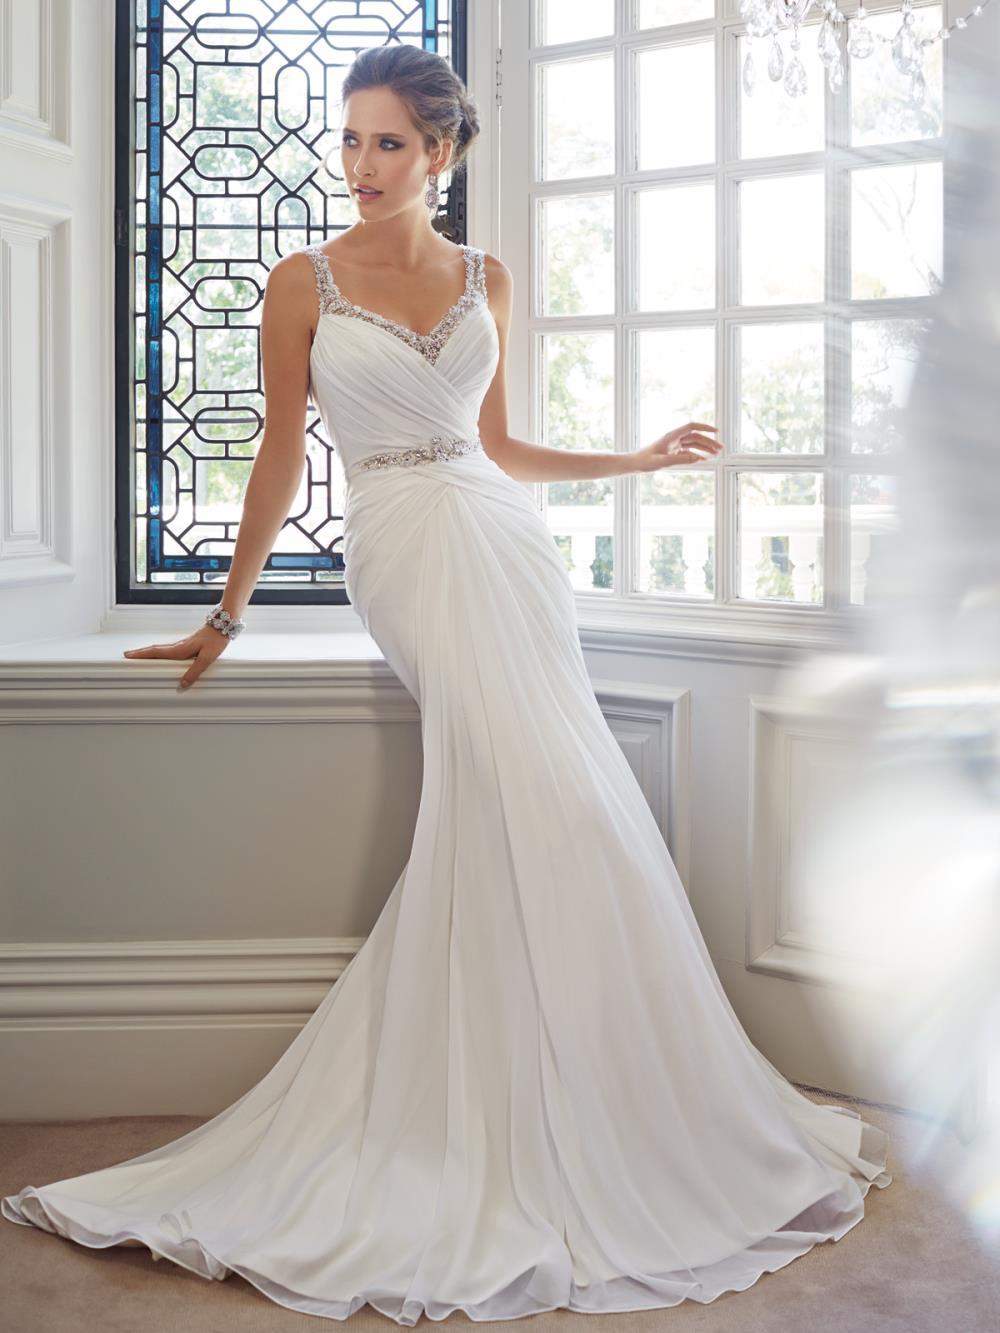 vjen C4 8Danice wedding dresses spaghetti strap wedding dress Stella York A line lace wedding dress Iain choice